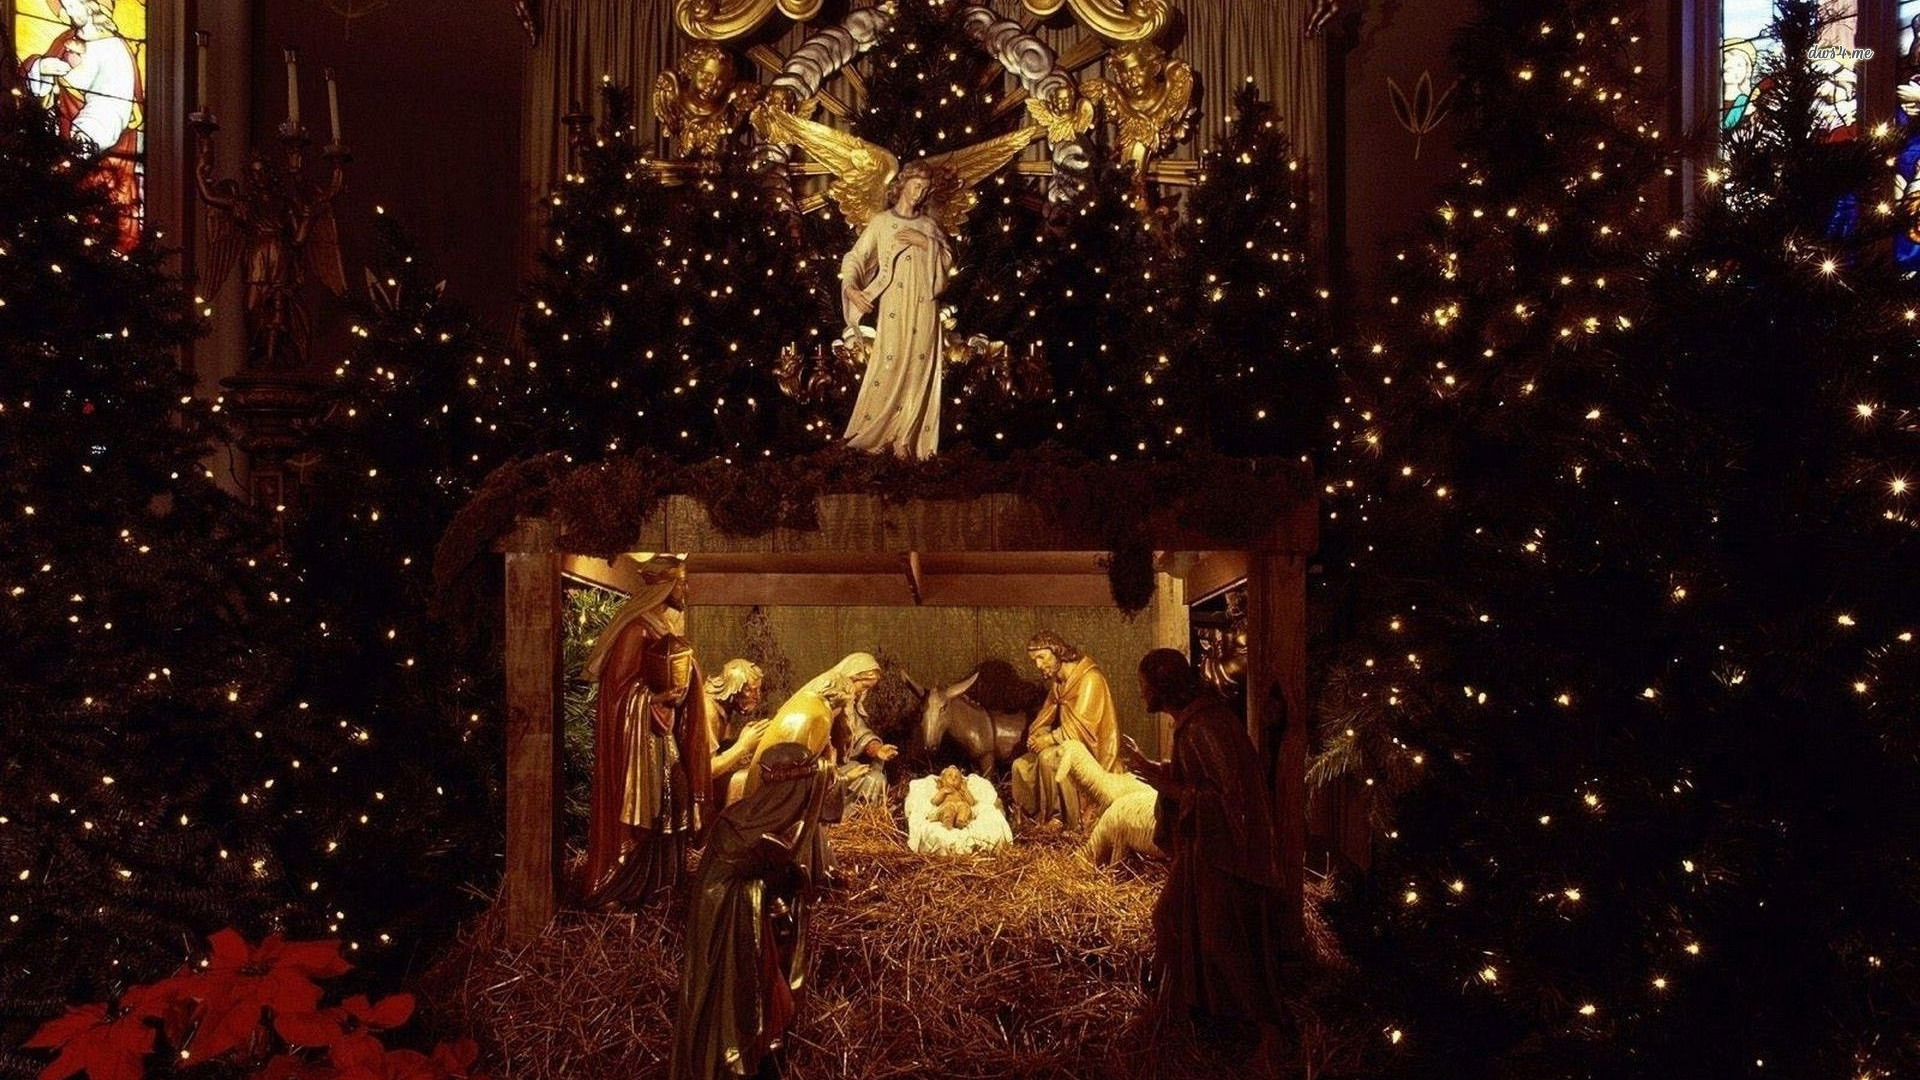 nativity wallpaper hd